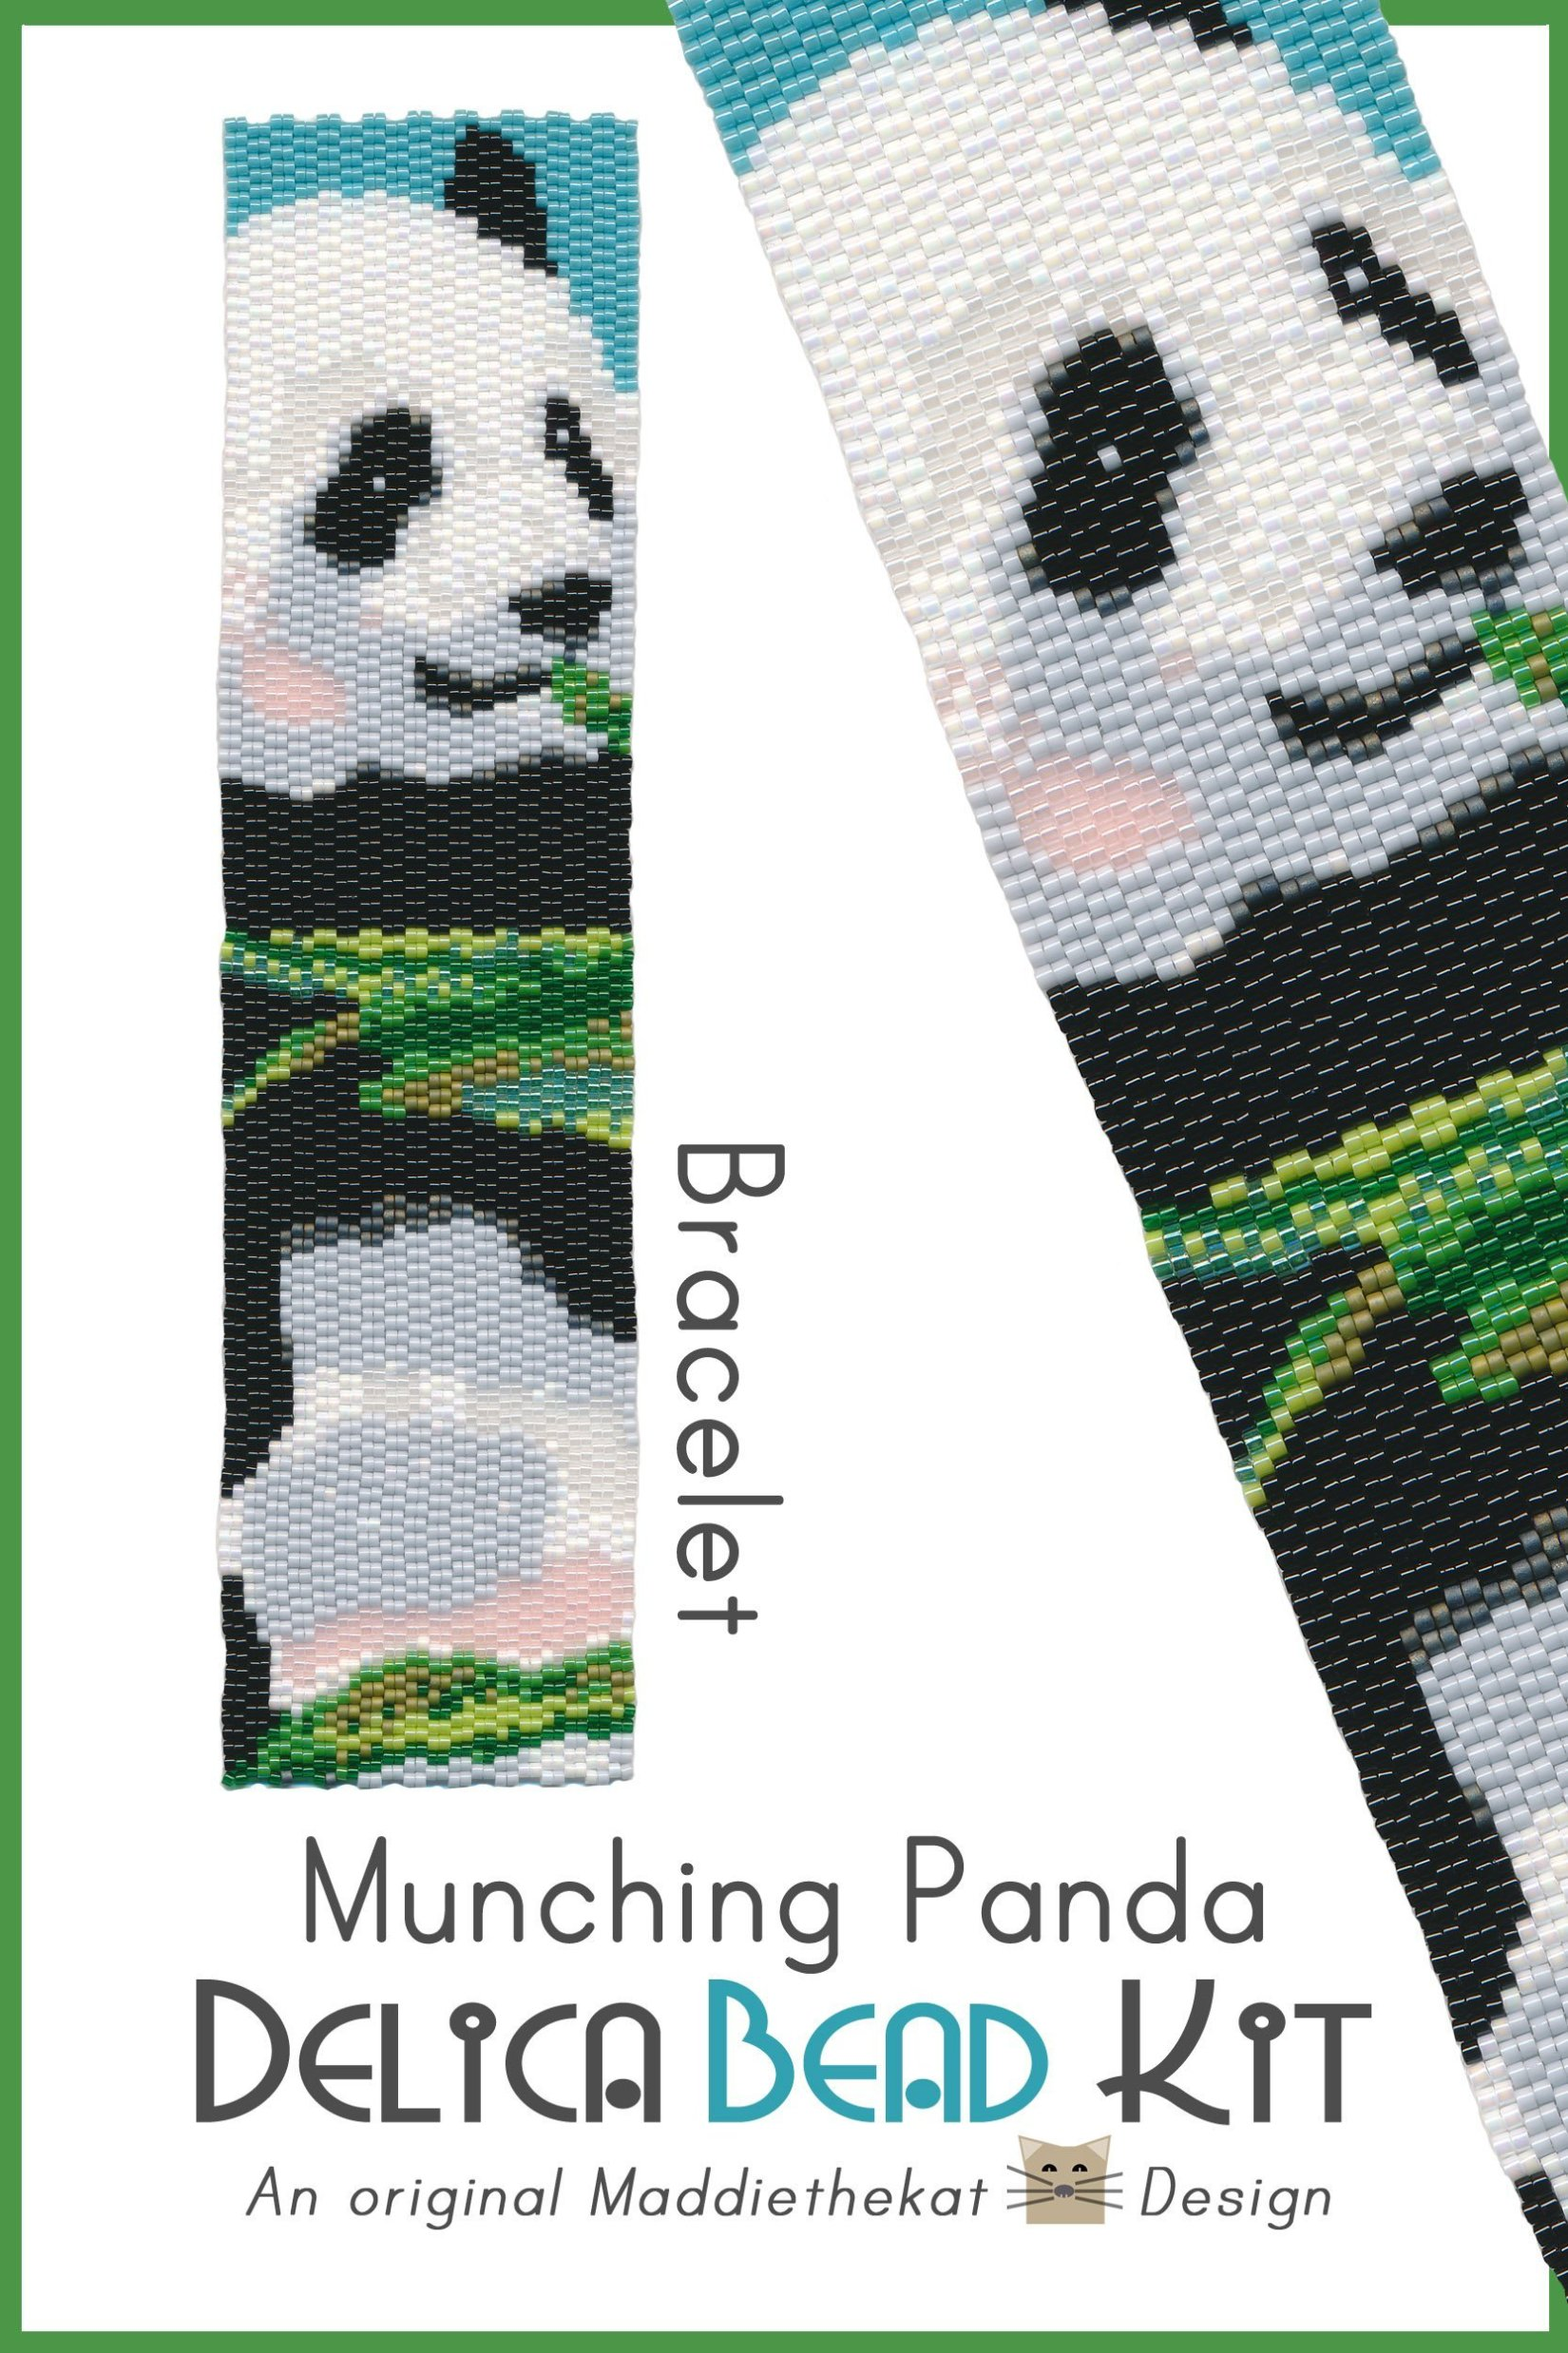 Munching Panda Wide Cuff Bracelet 2-Drop Peyote Bead Pattern or Bead Kit